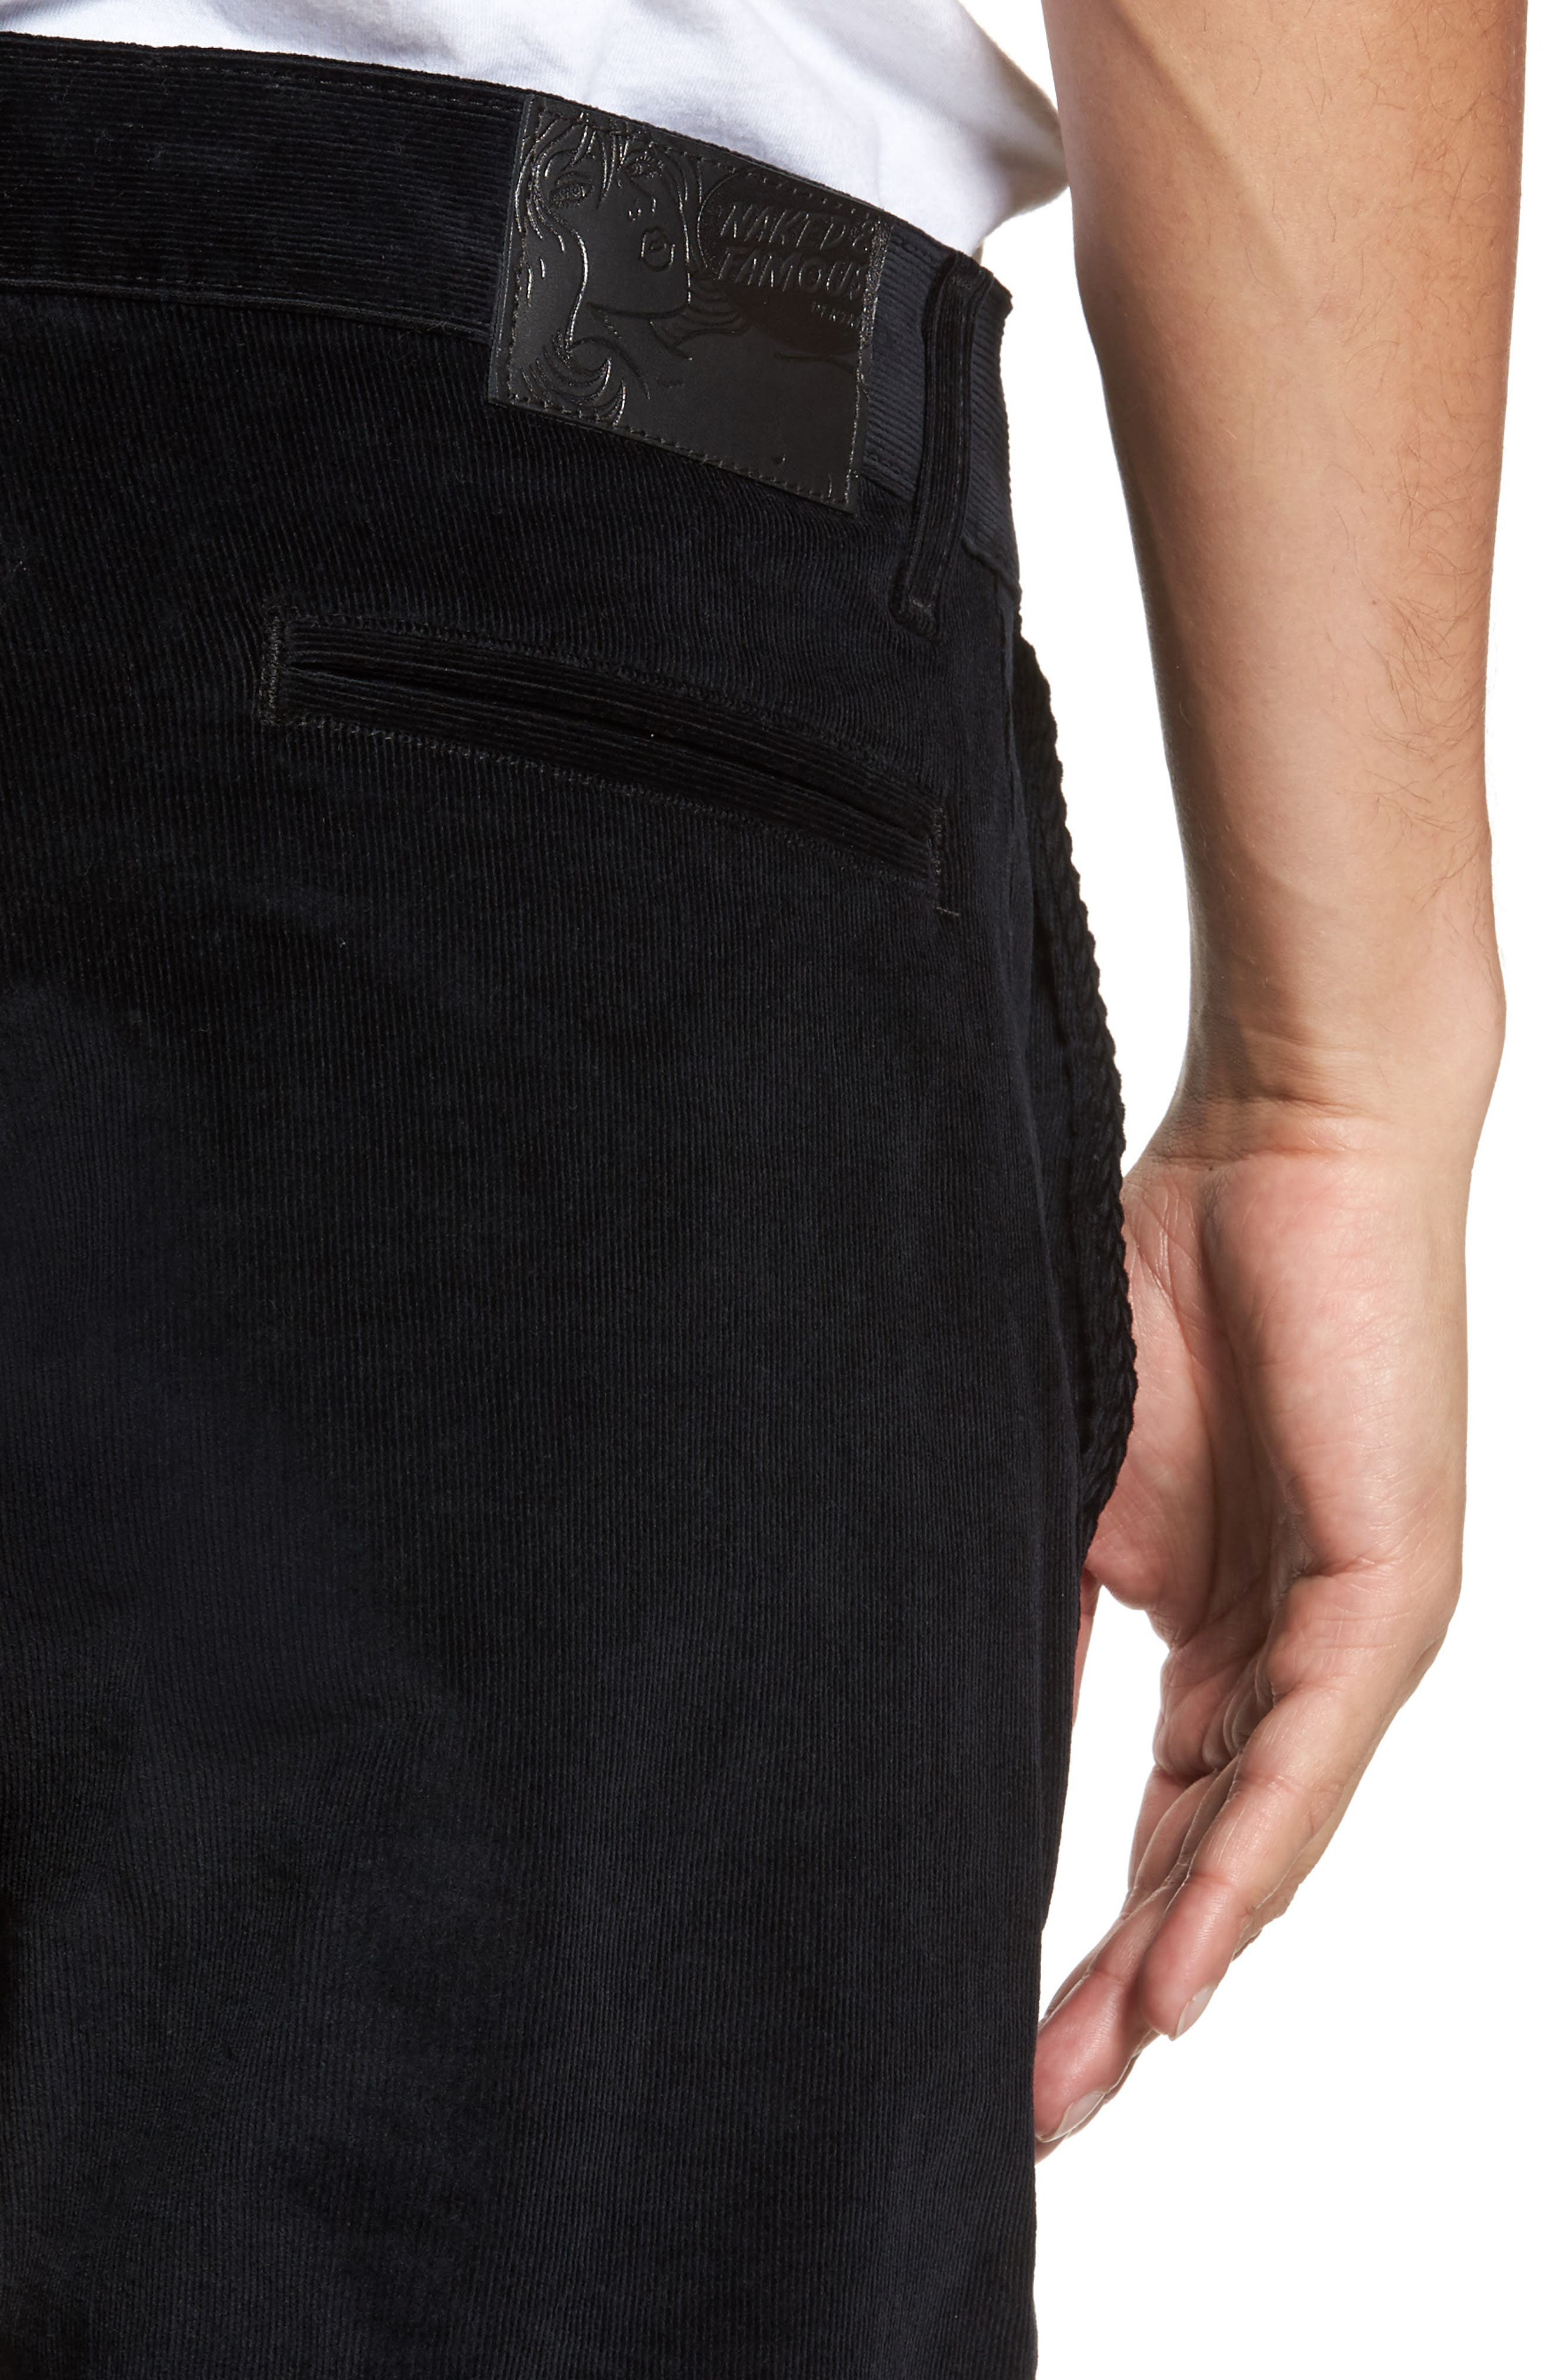 Naked & Famous Slim Chino Slim Fit Corduroy Pants,                             Alternate thumbnail 4, color,